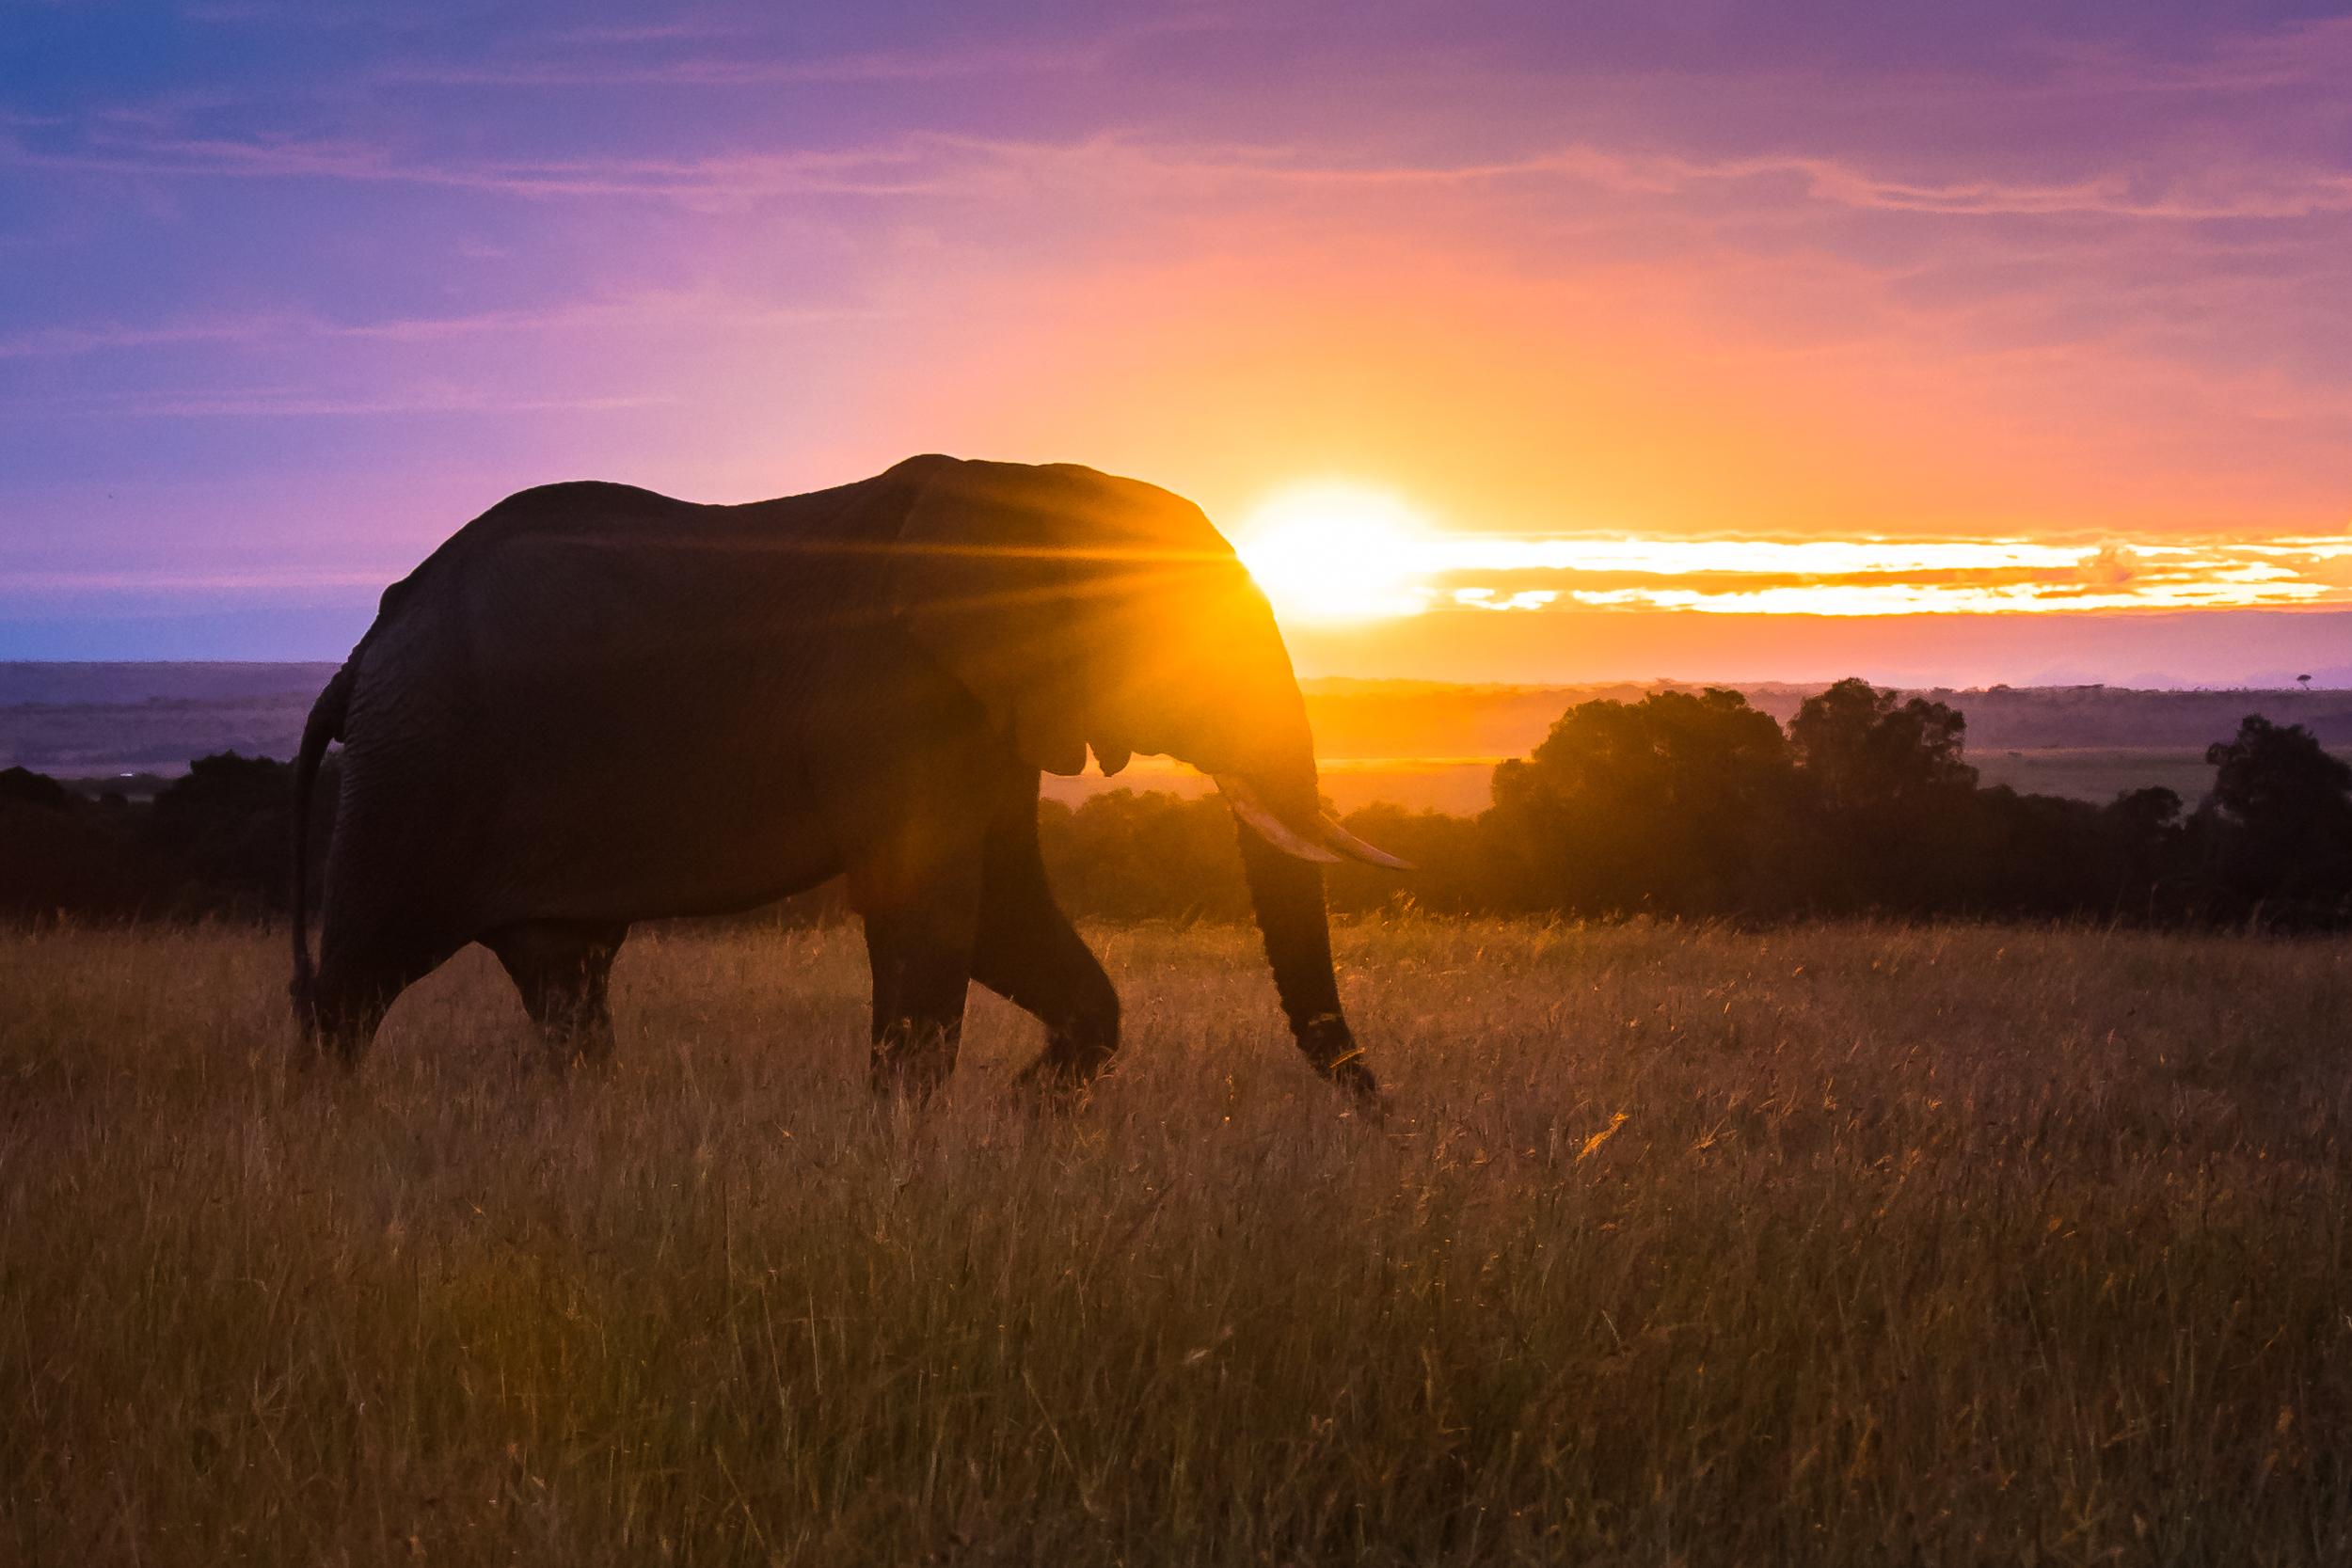 An elephant walks just as the sun comes up in the Maasai Mara, Kenya